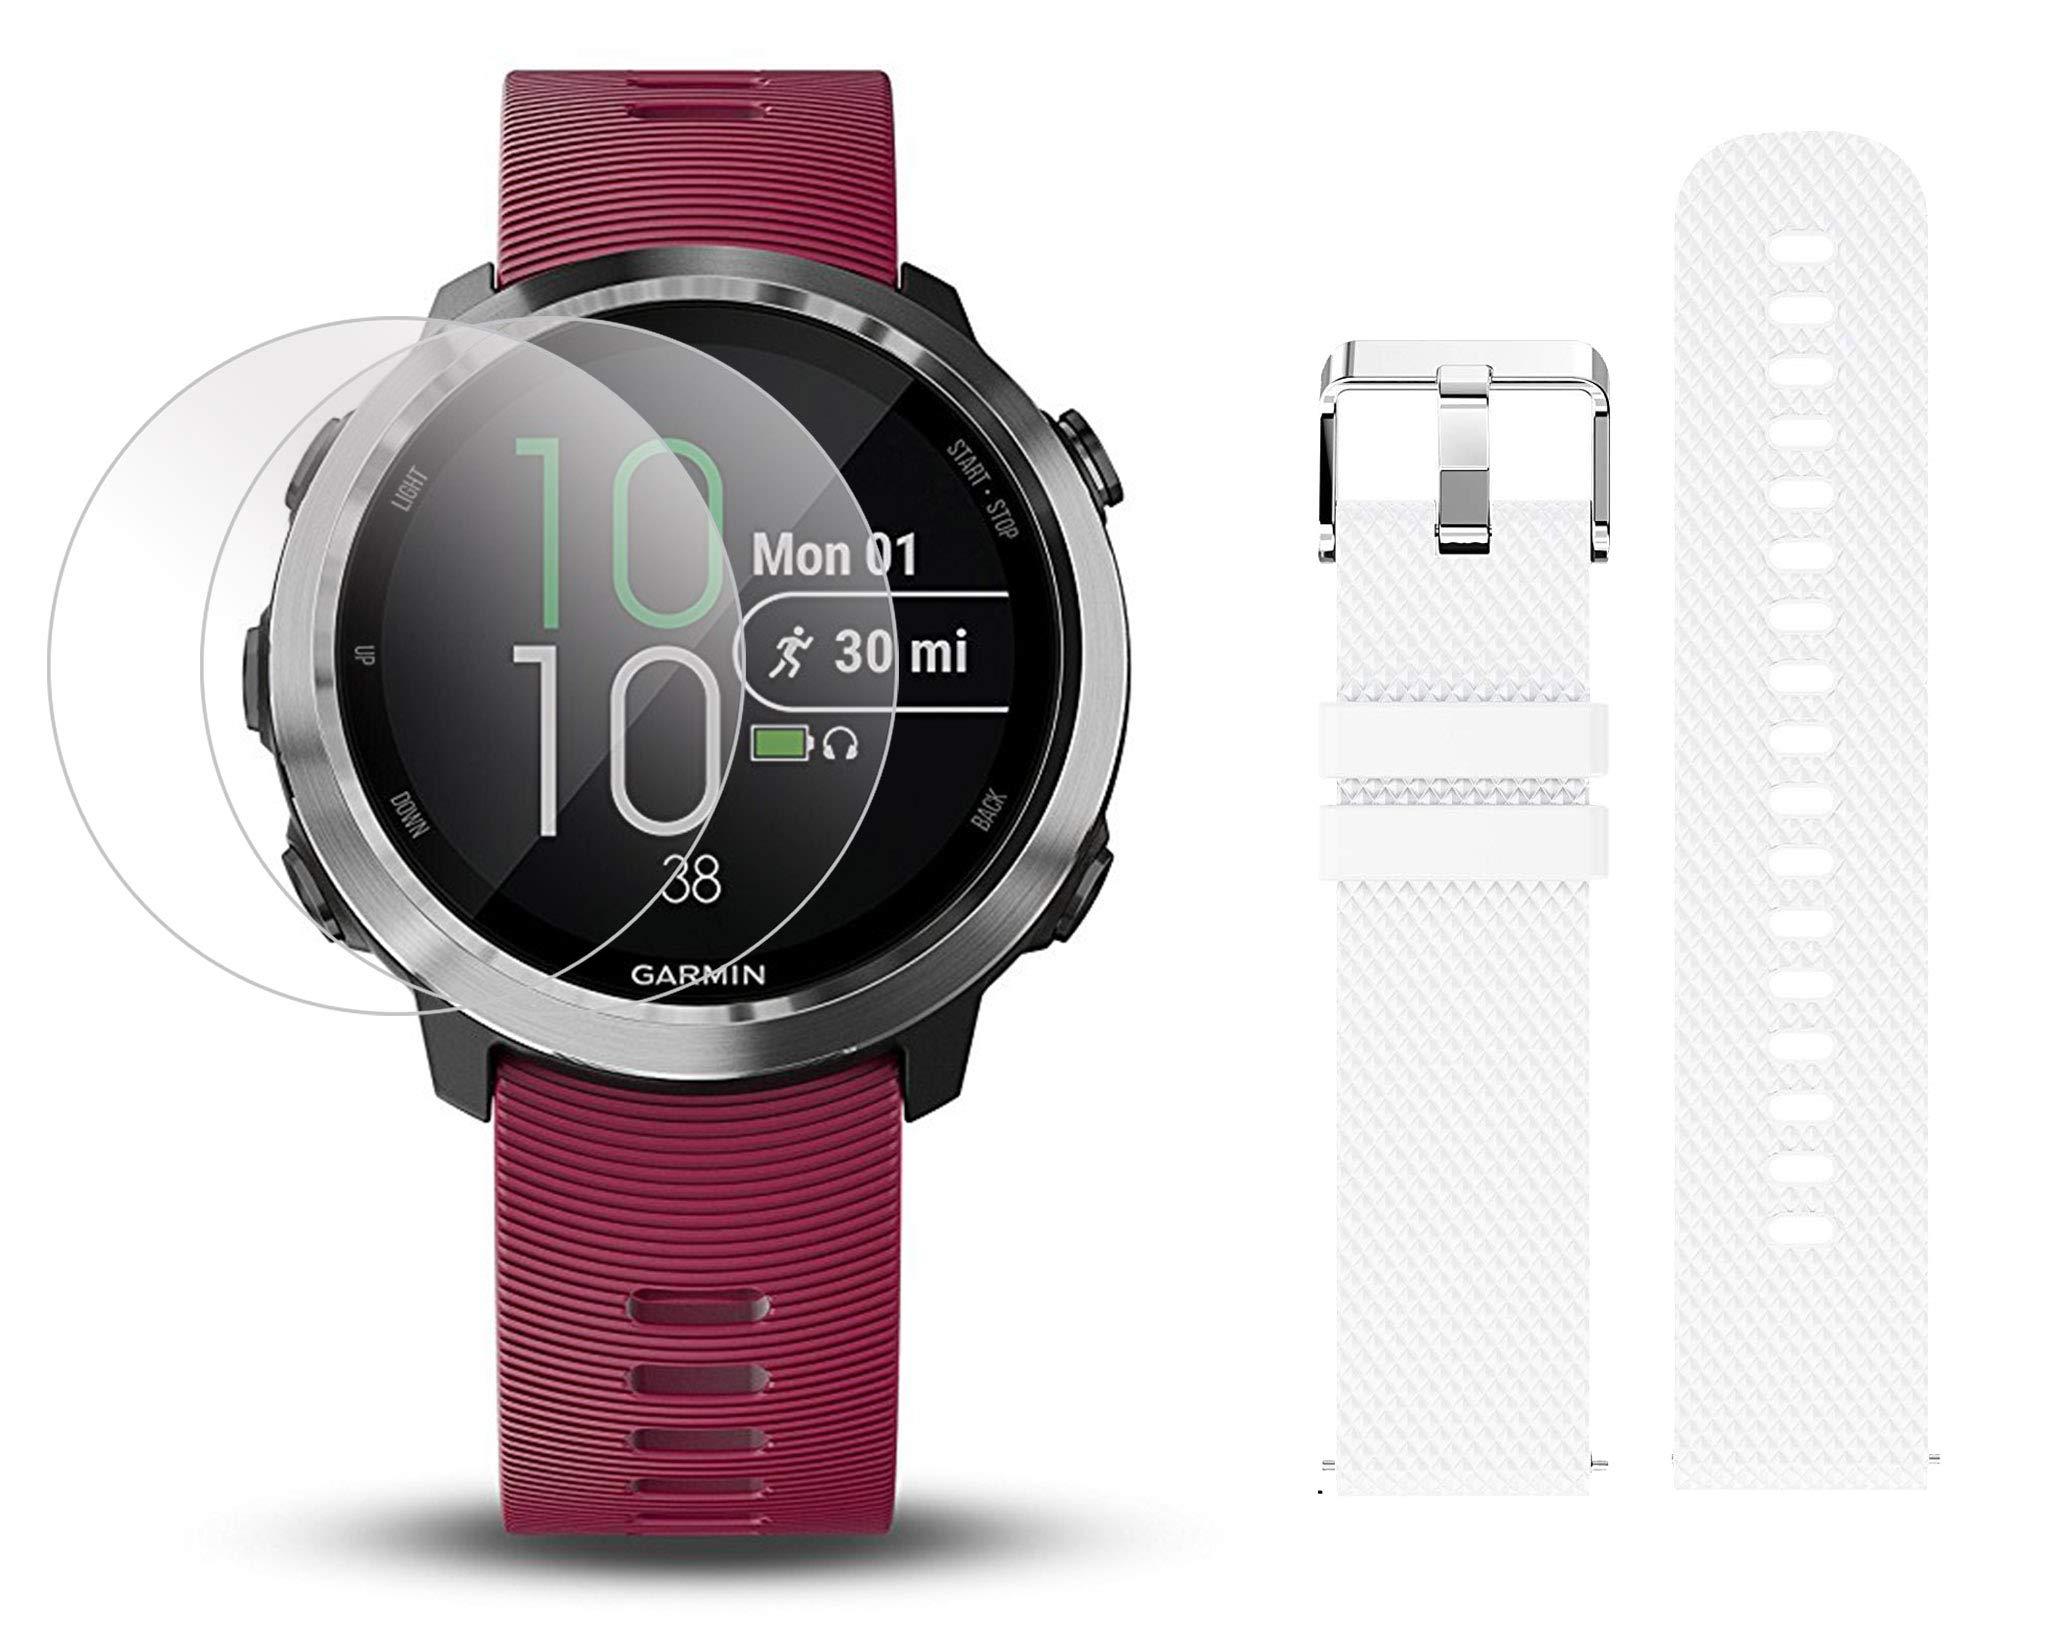 Garmin Forerunner 645 Music Bundle with Extra Band & HD Screen Protector Film (x4) | Running GPS Watch, Wrist HR, Music & Spotify, Garmin Pay (Cerise + Music, White)